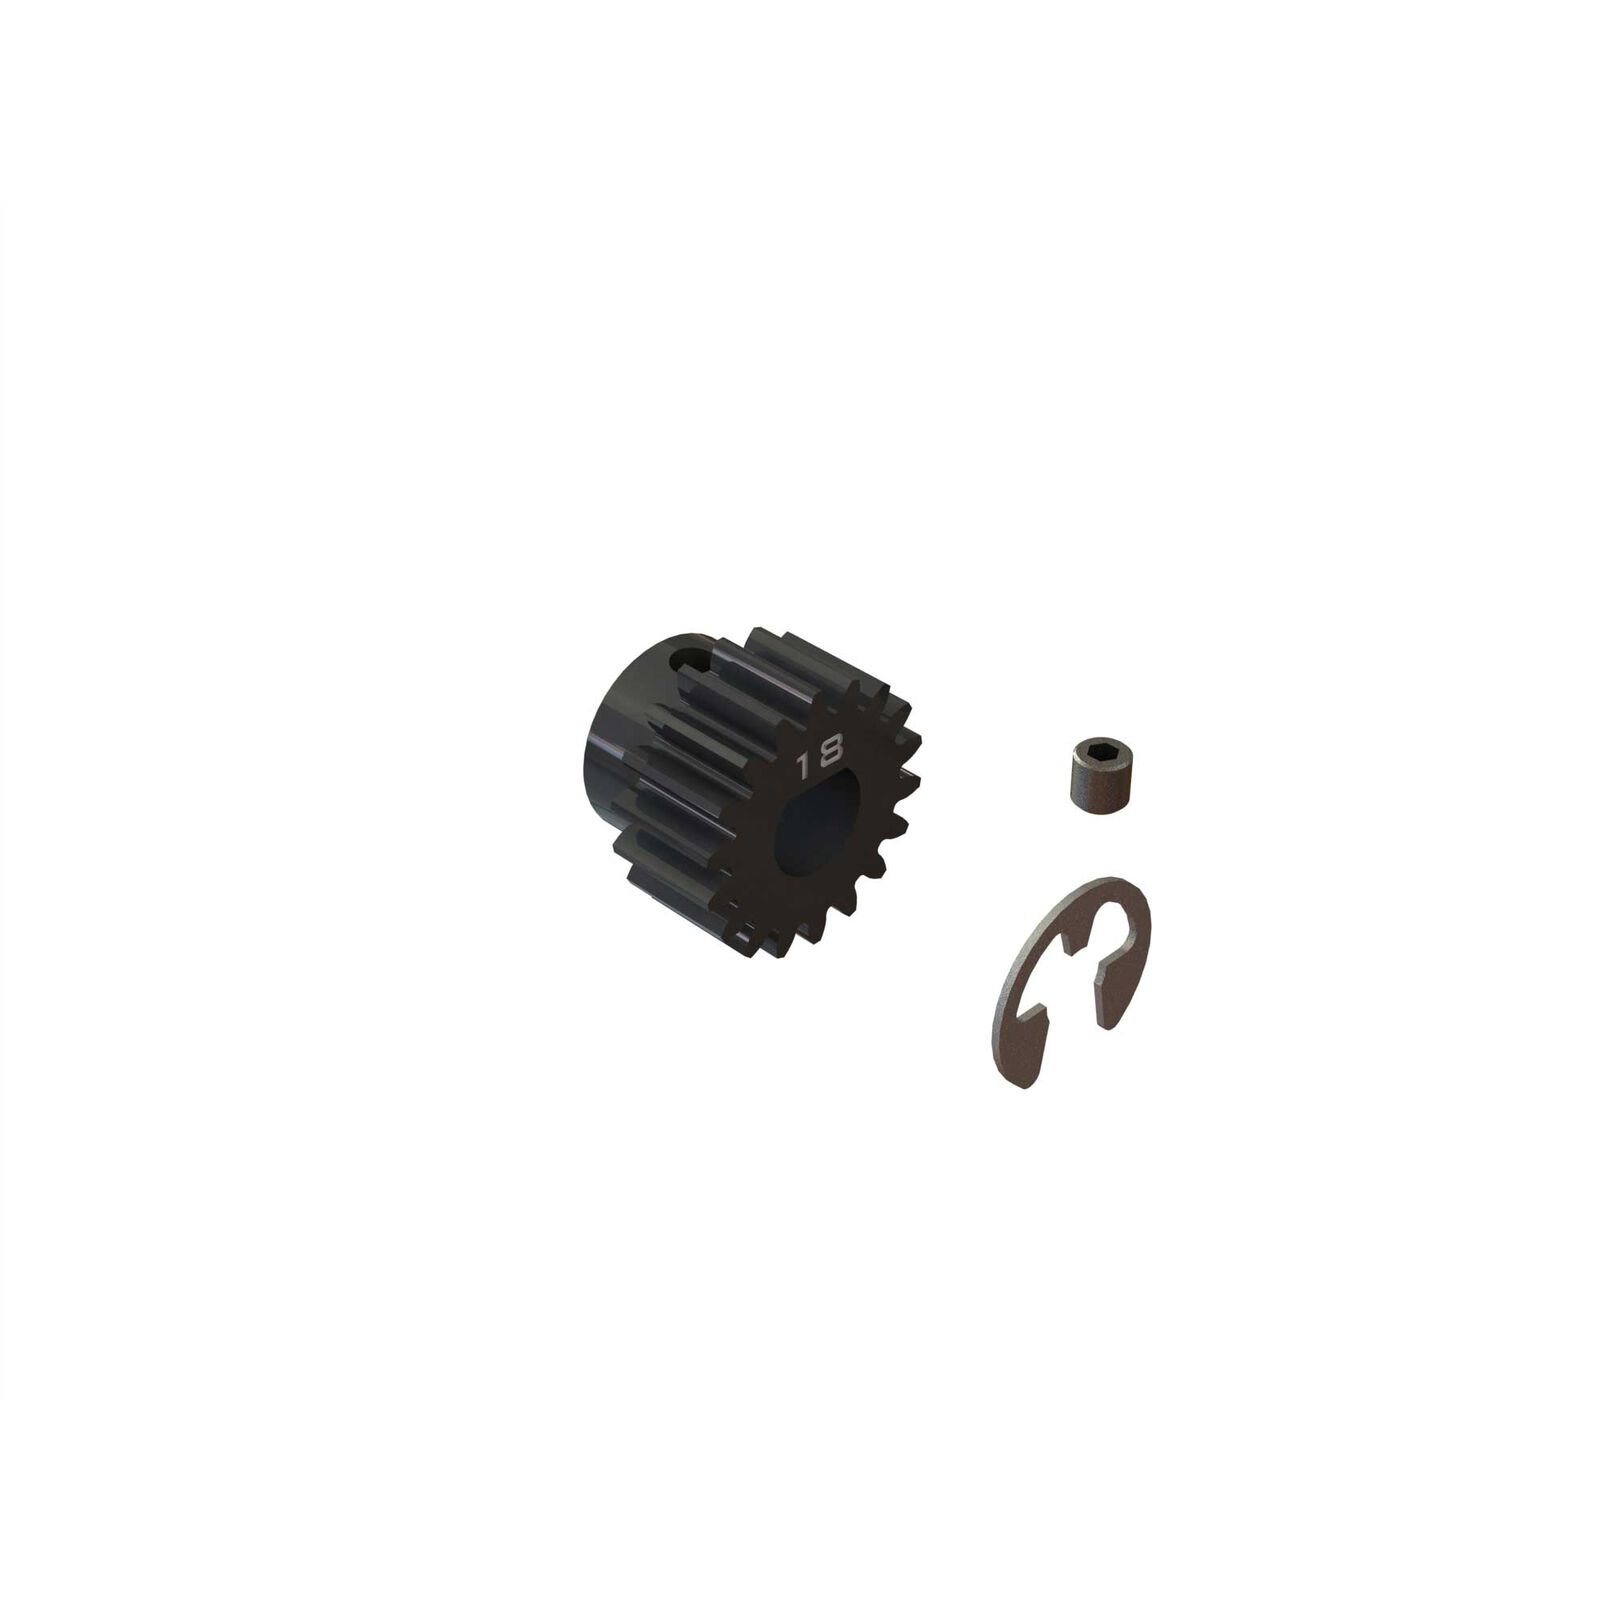 18T Mod1 Safe-D8 Pinion Gear